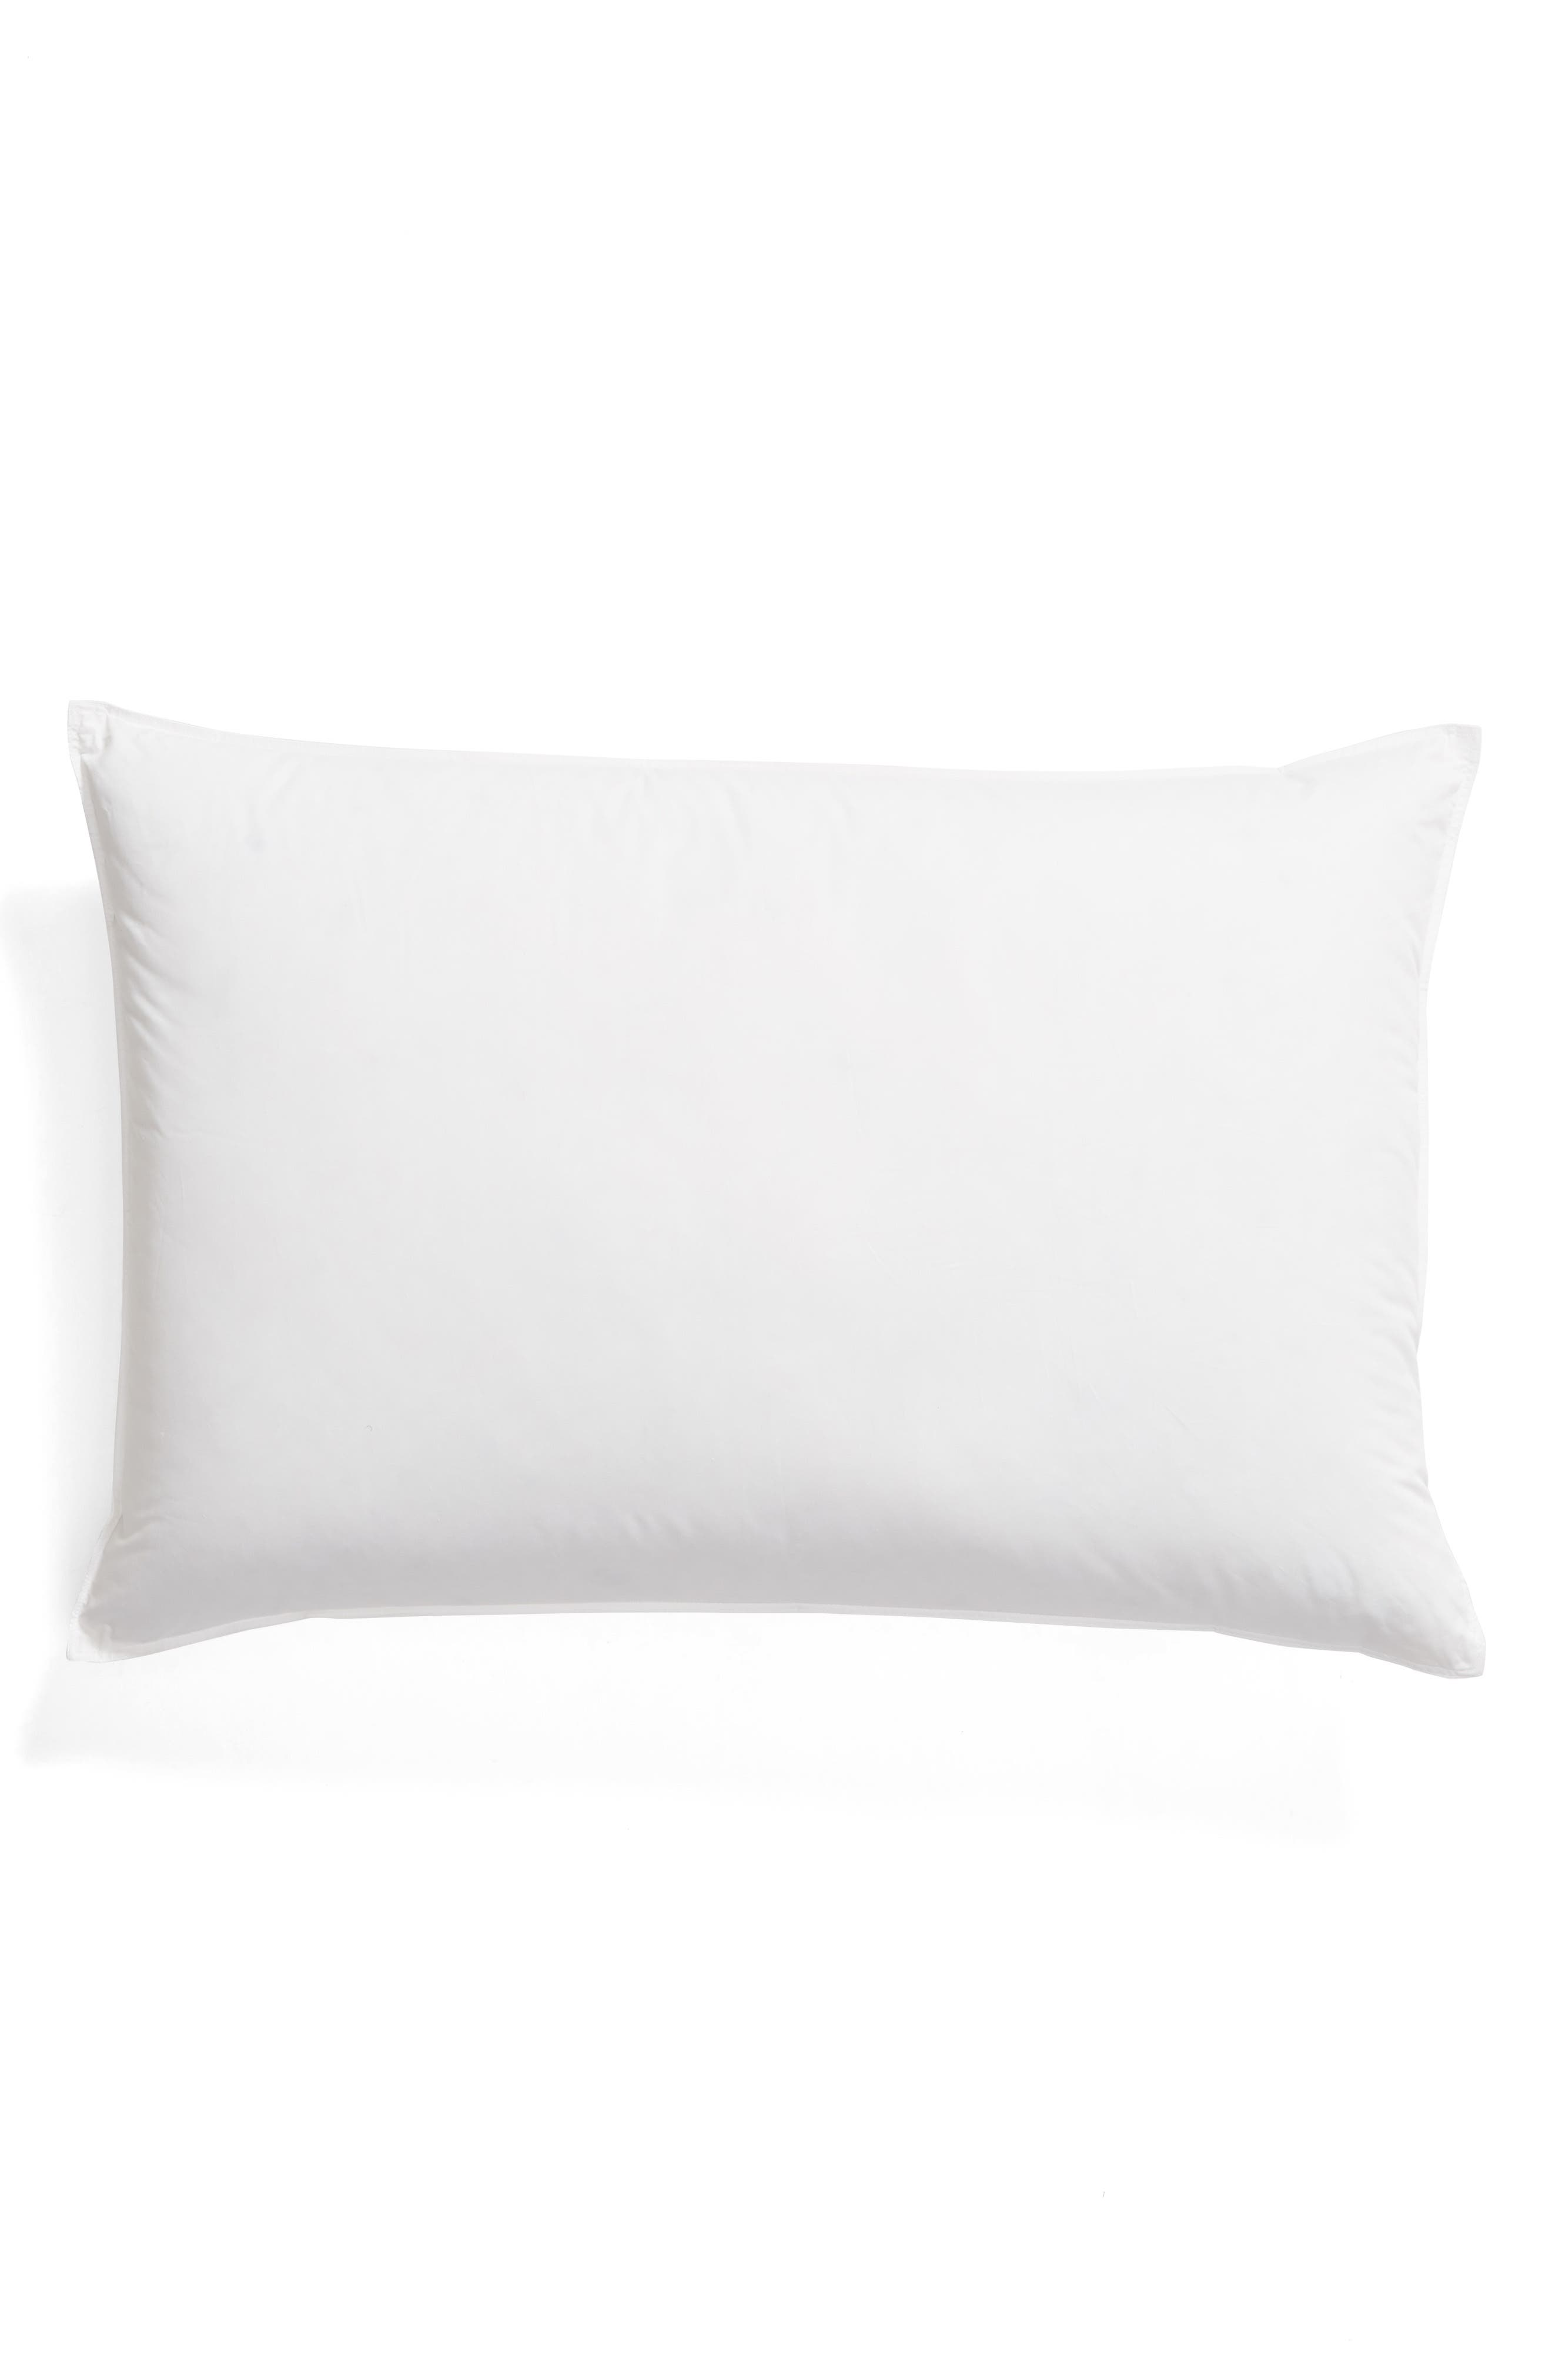 MATOUK,                             Valletto Medium 650 Fill Power Down 400 Thread Count Pillow,                             Main thumbnail 1, color,                             WHITE